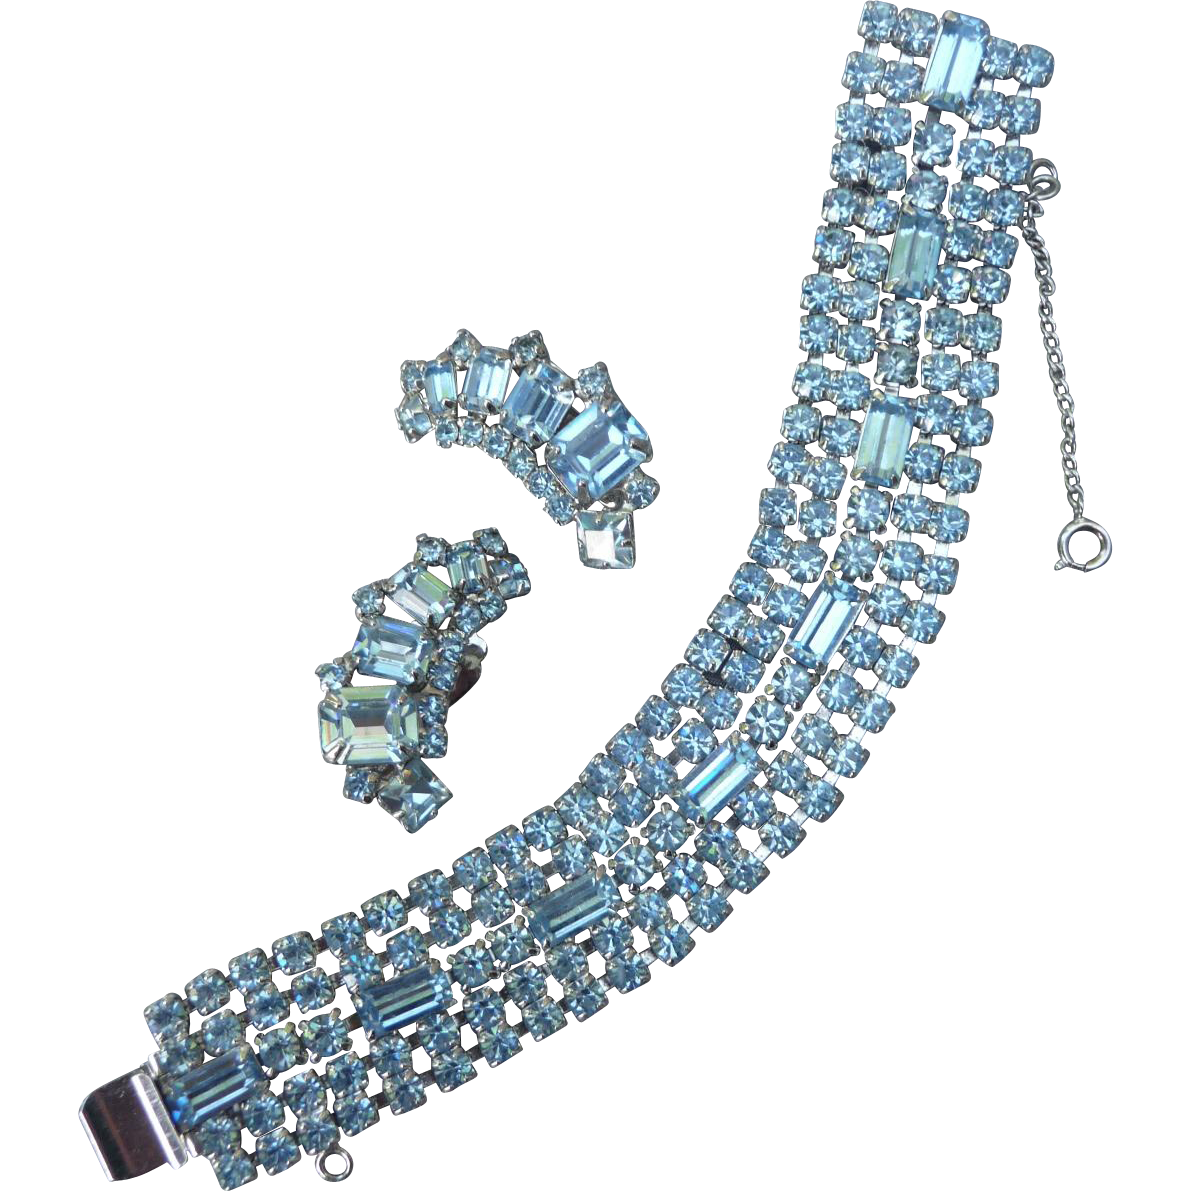 exquisite vintage weiss bracelet and earrings hiptobeold. Black Bedroom Furniture Sets. Home Design Ideas